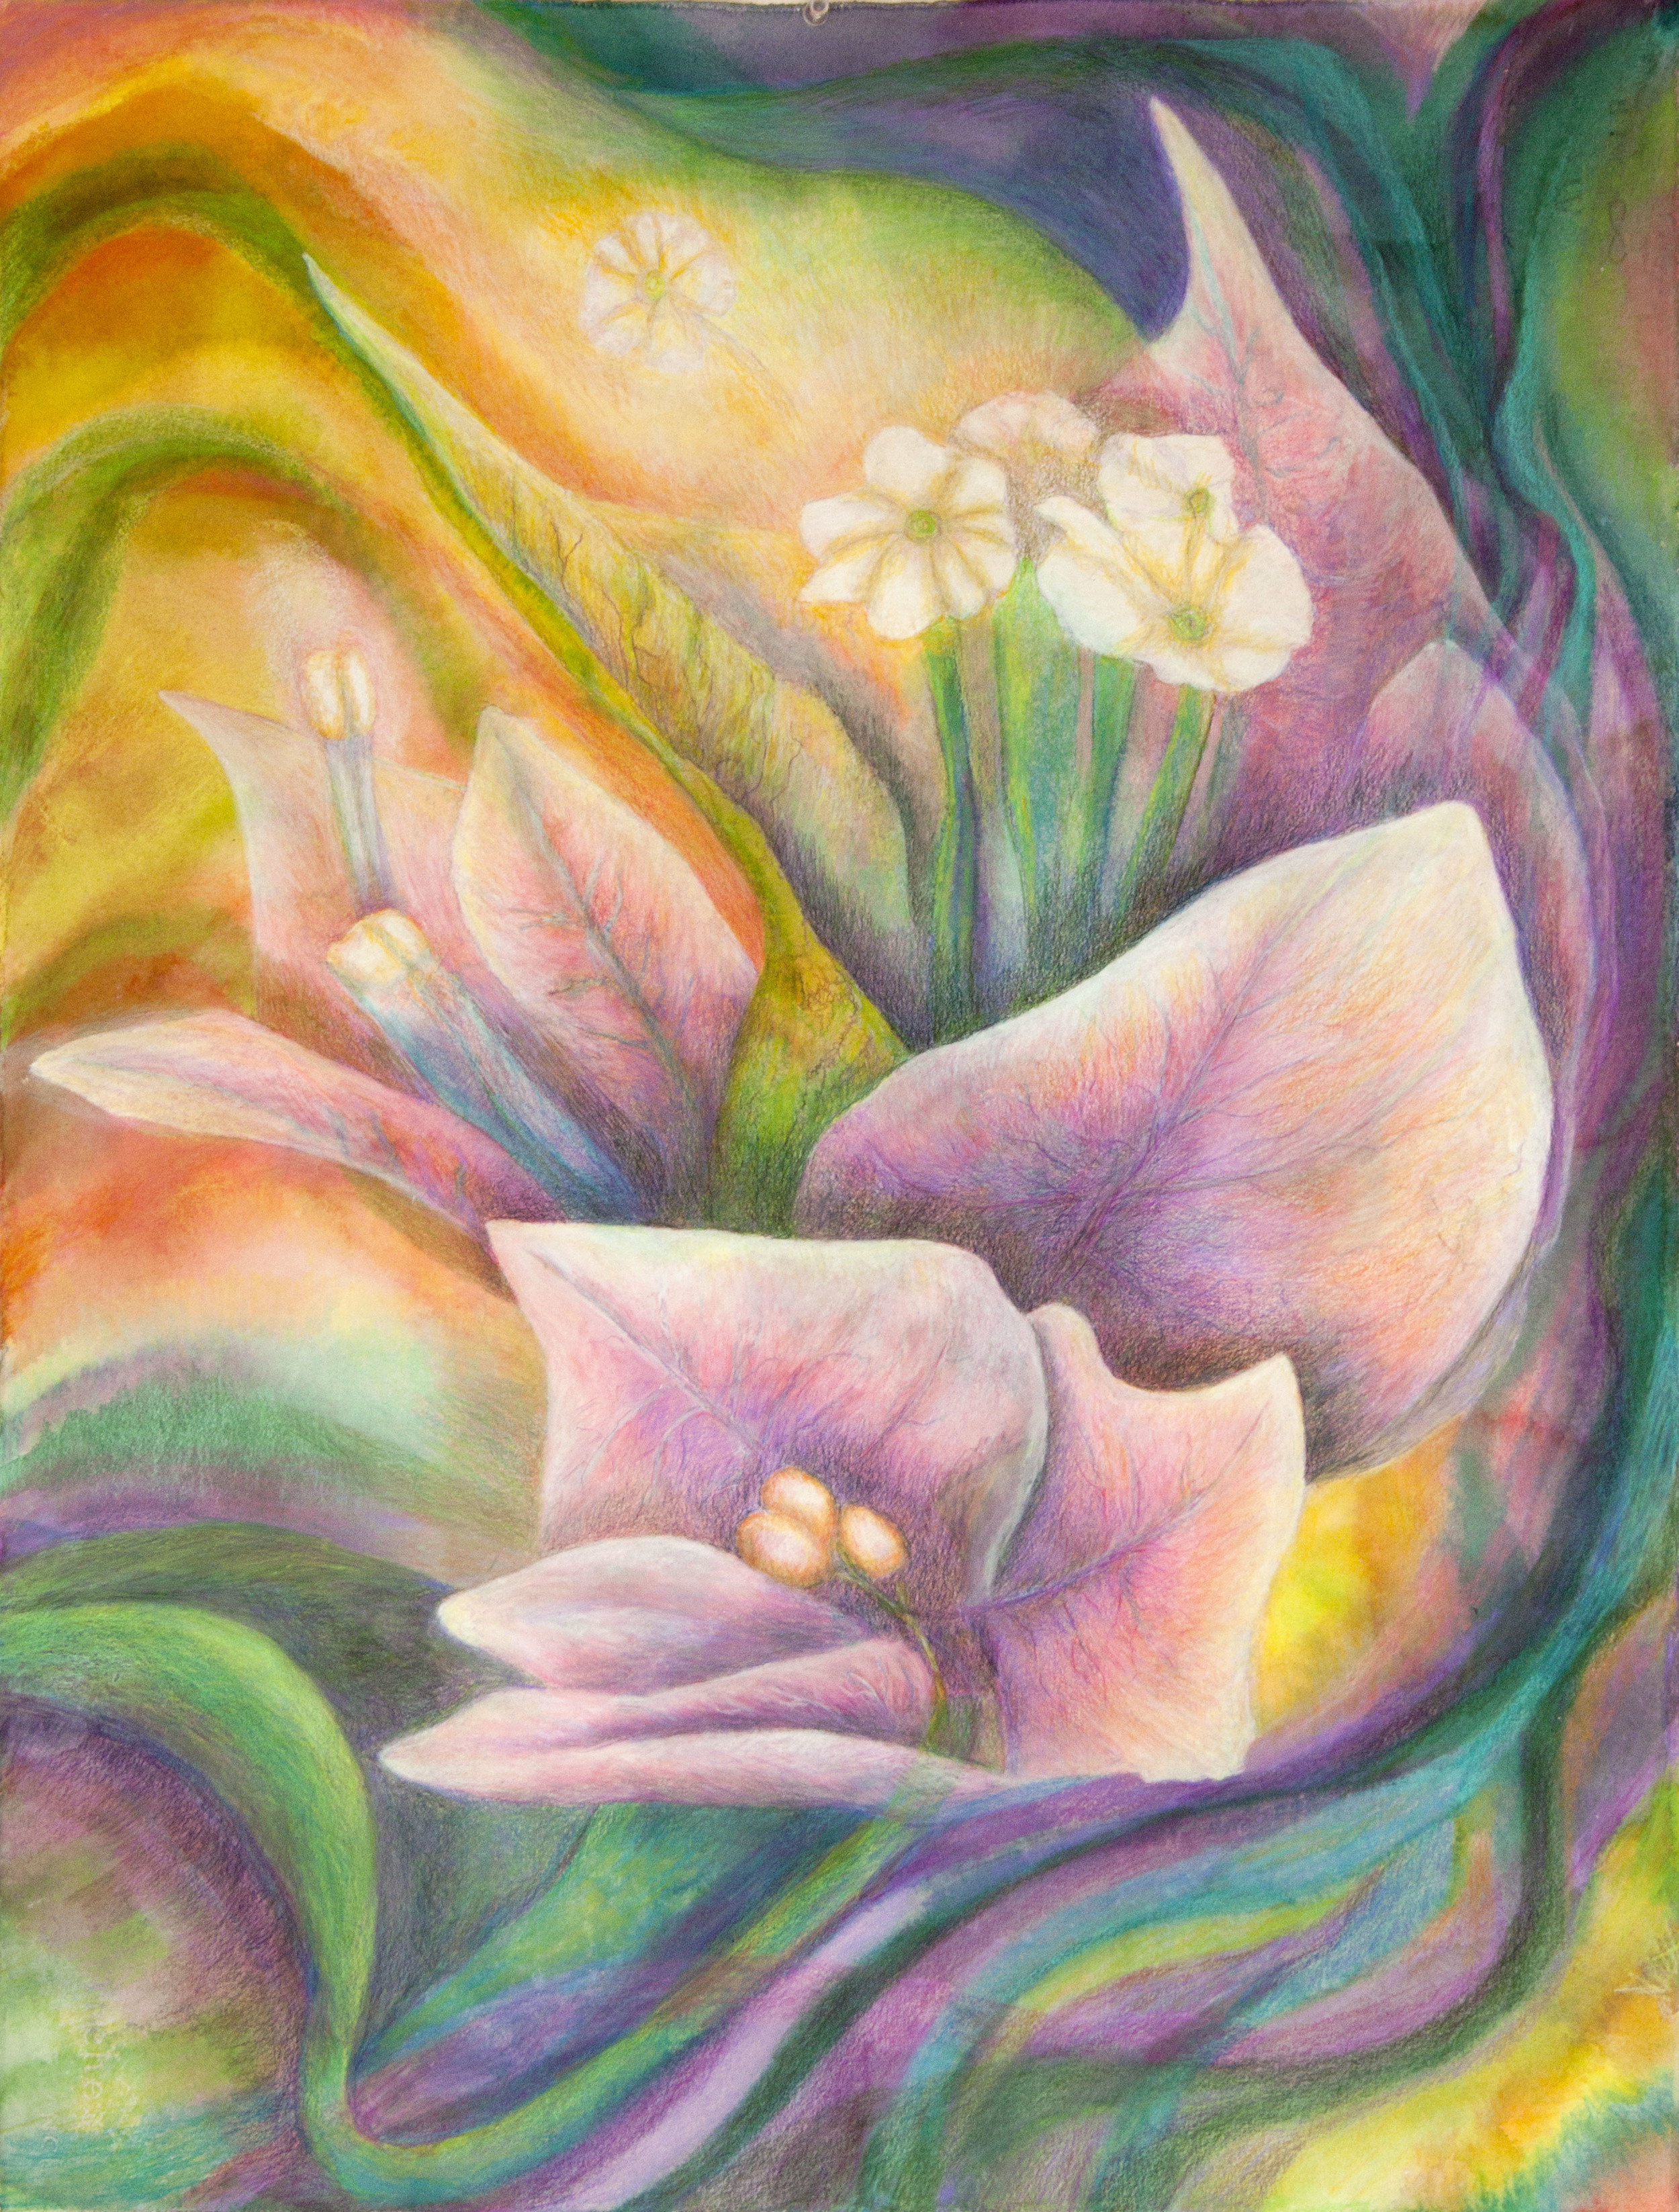 Radient Blossom